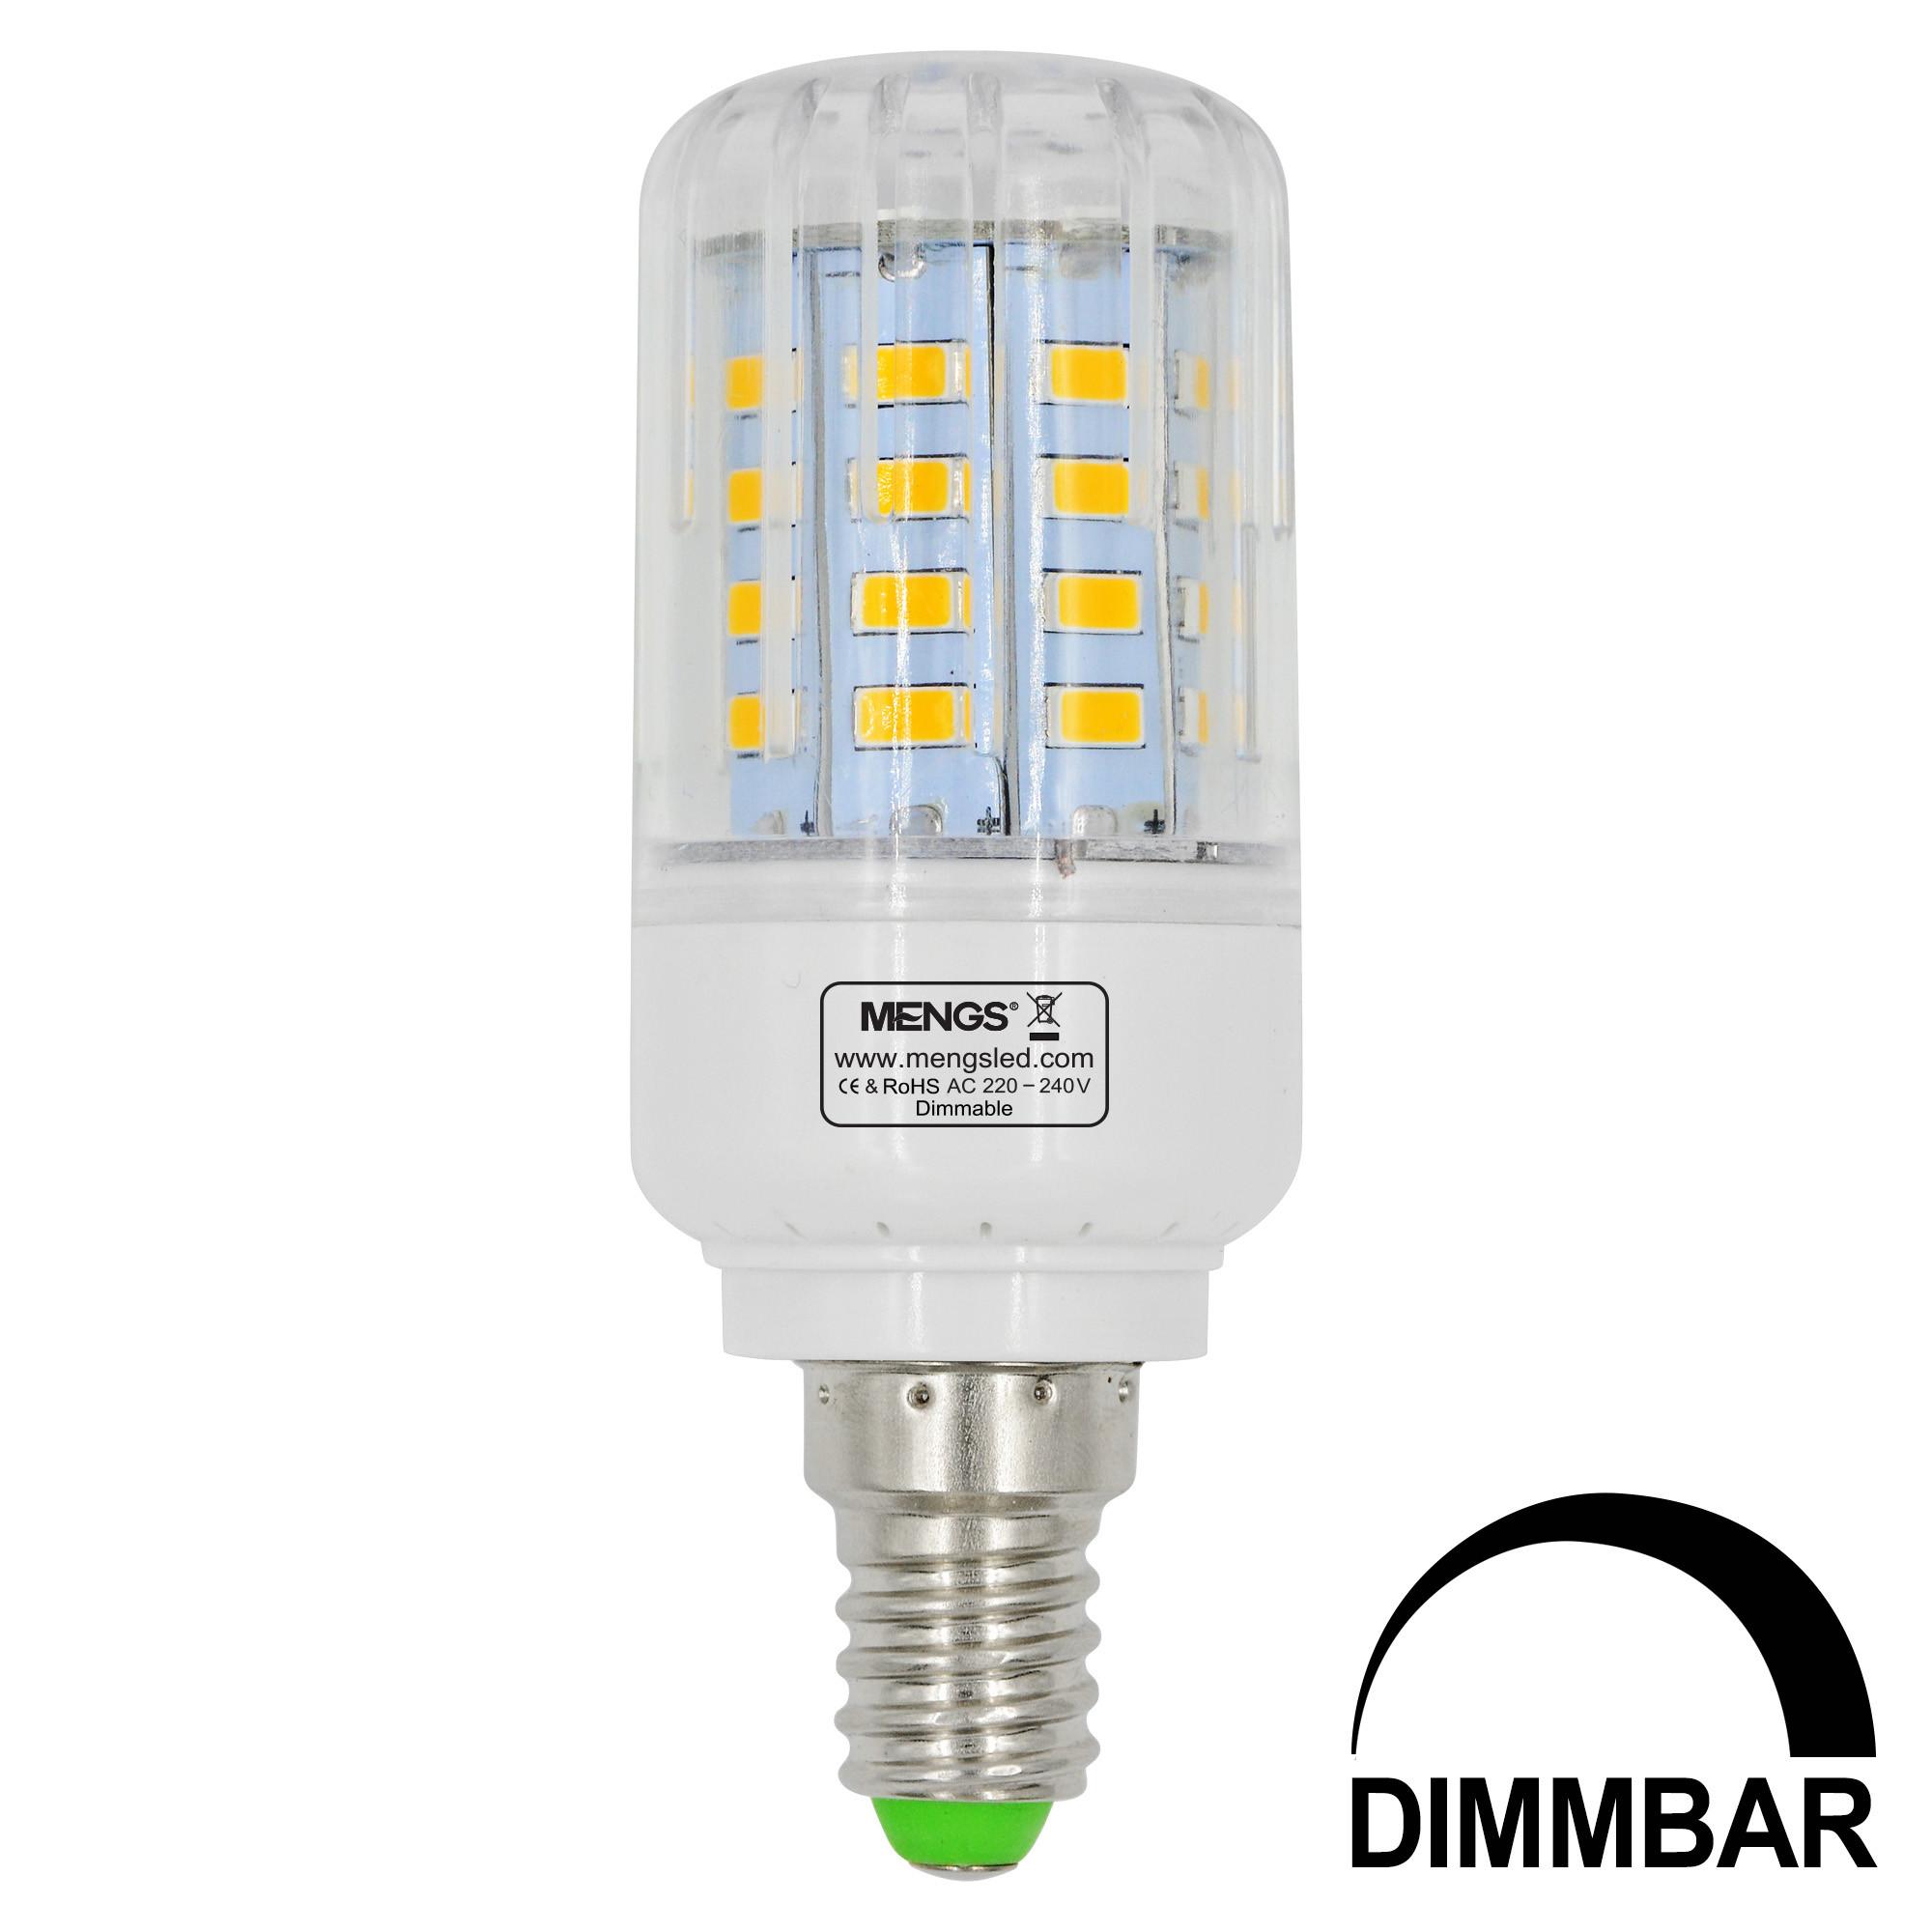 e14 5w led dimmable corn light 40x 5736 smd led bulb lamp ac 220 240v in warm white energy. Black Bedroom Furniture Sets. Home Design Ideas